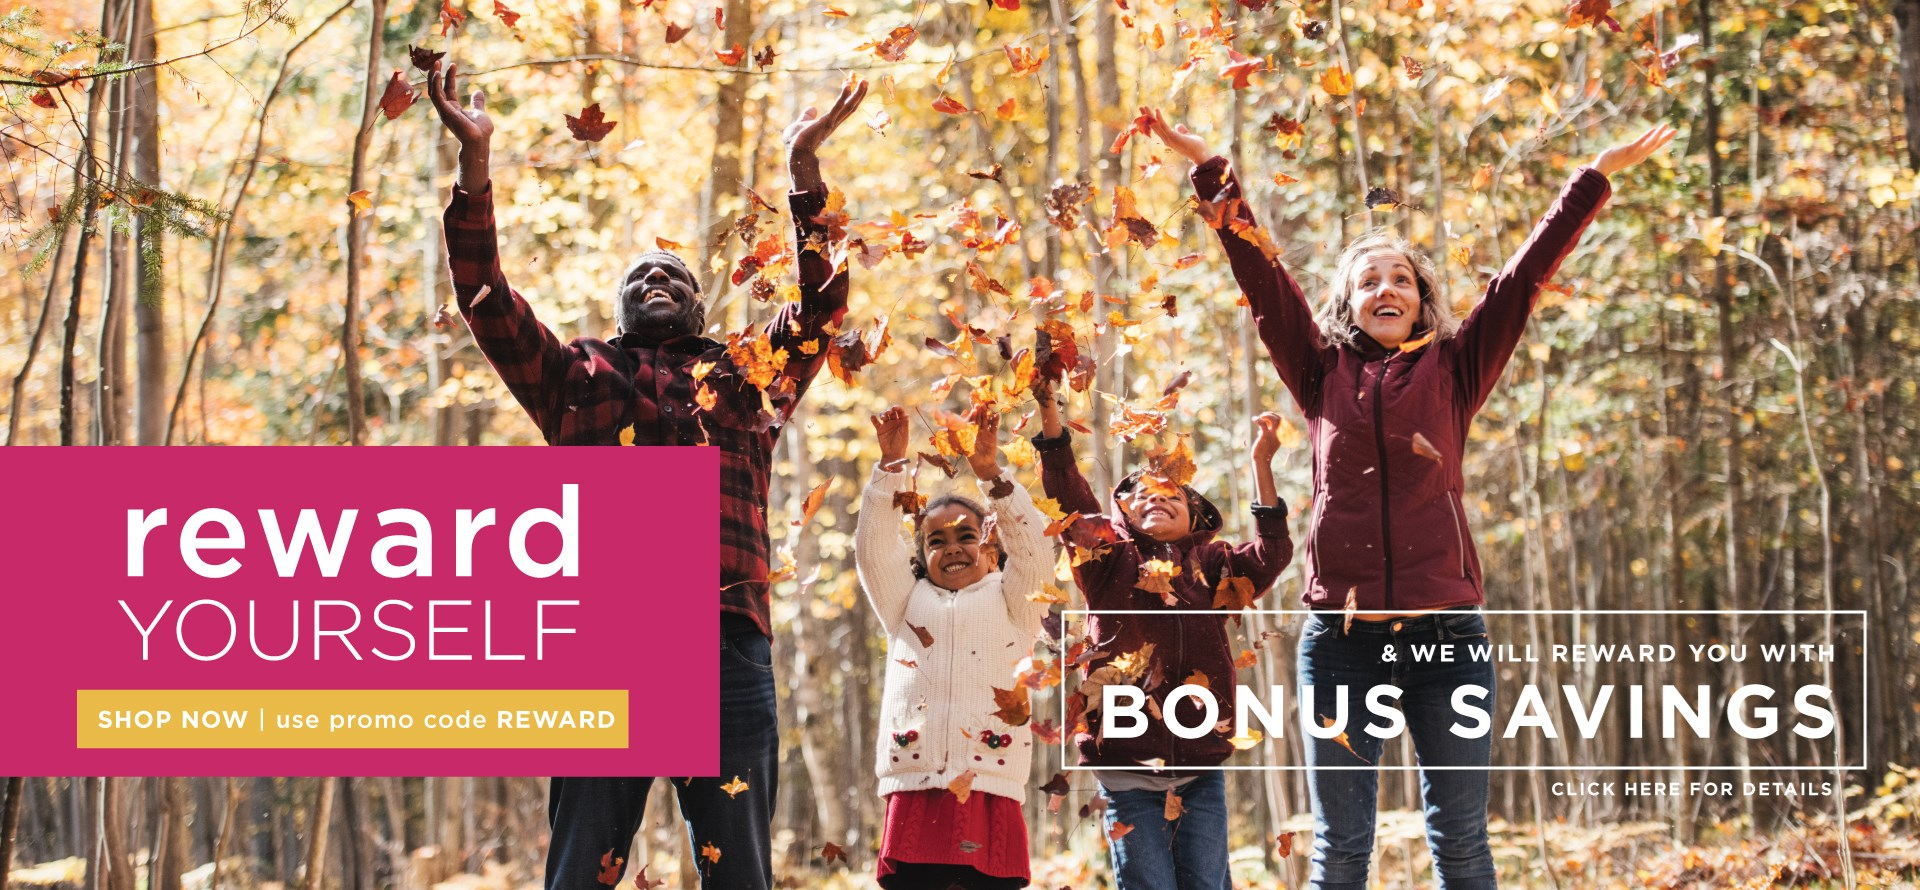 Reward Yourself & we will reward you with Bonus Savings | Shop Now and Use Promo Code REWARD